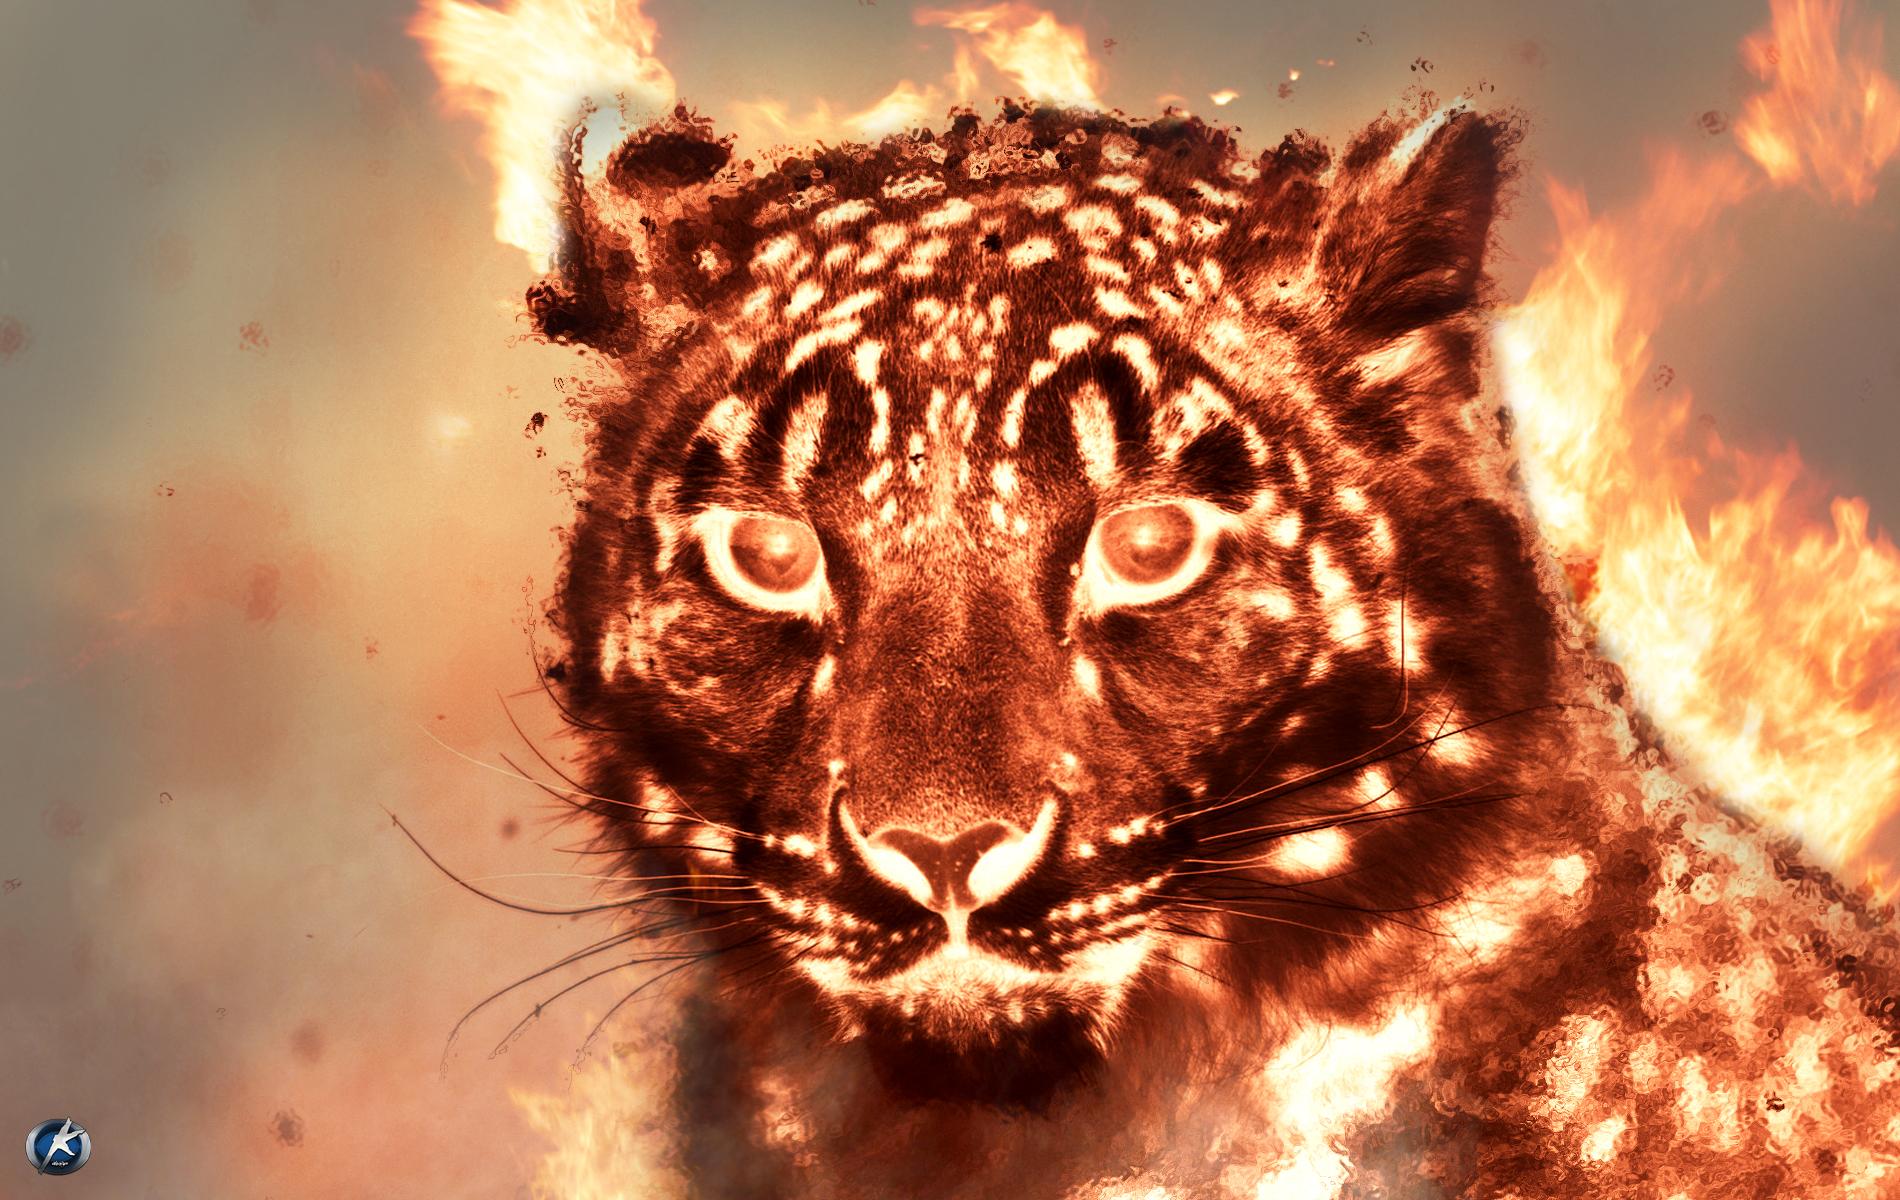 Fire Tiger Wallpaper by Okman179 on DeviantArt